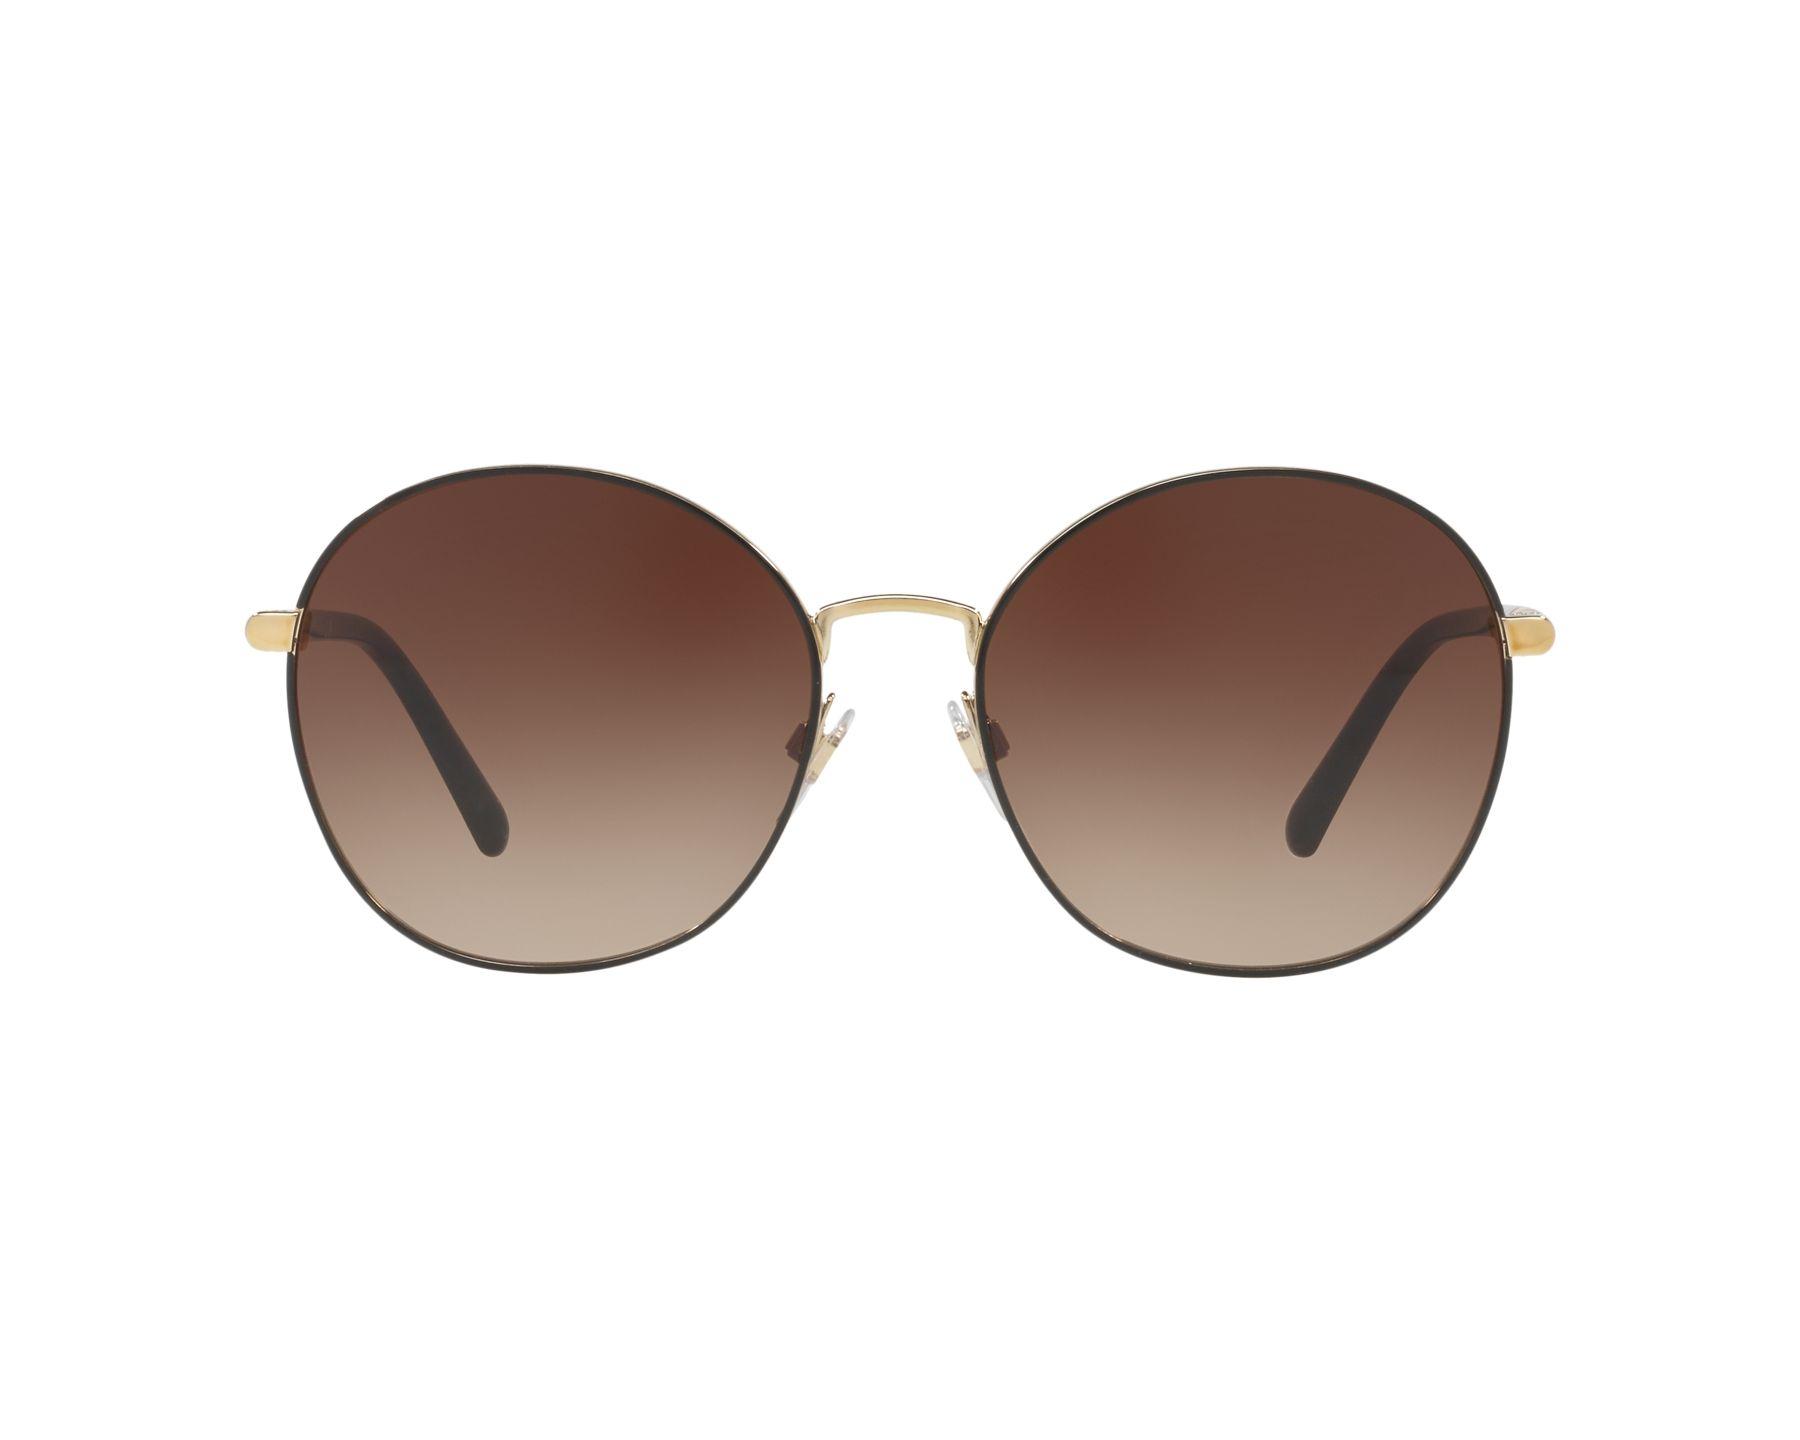 66d0cbf9ccc Sunglasses Burberry BE-3094 114513 56-17 Black Gold 360 degree view 1